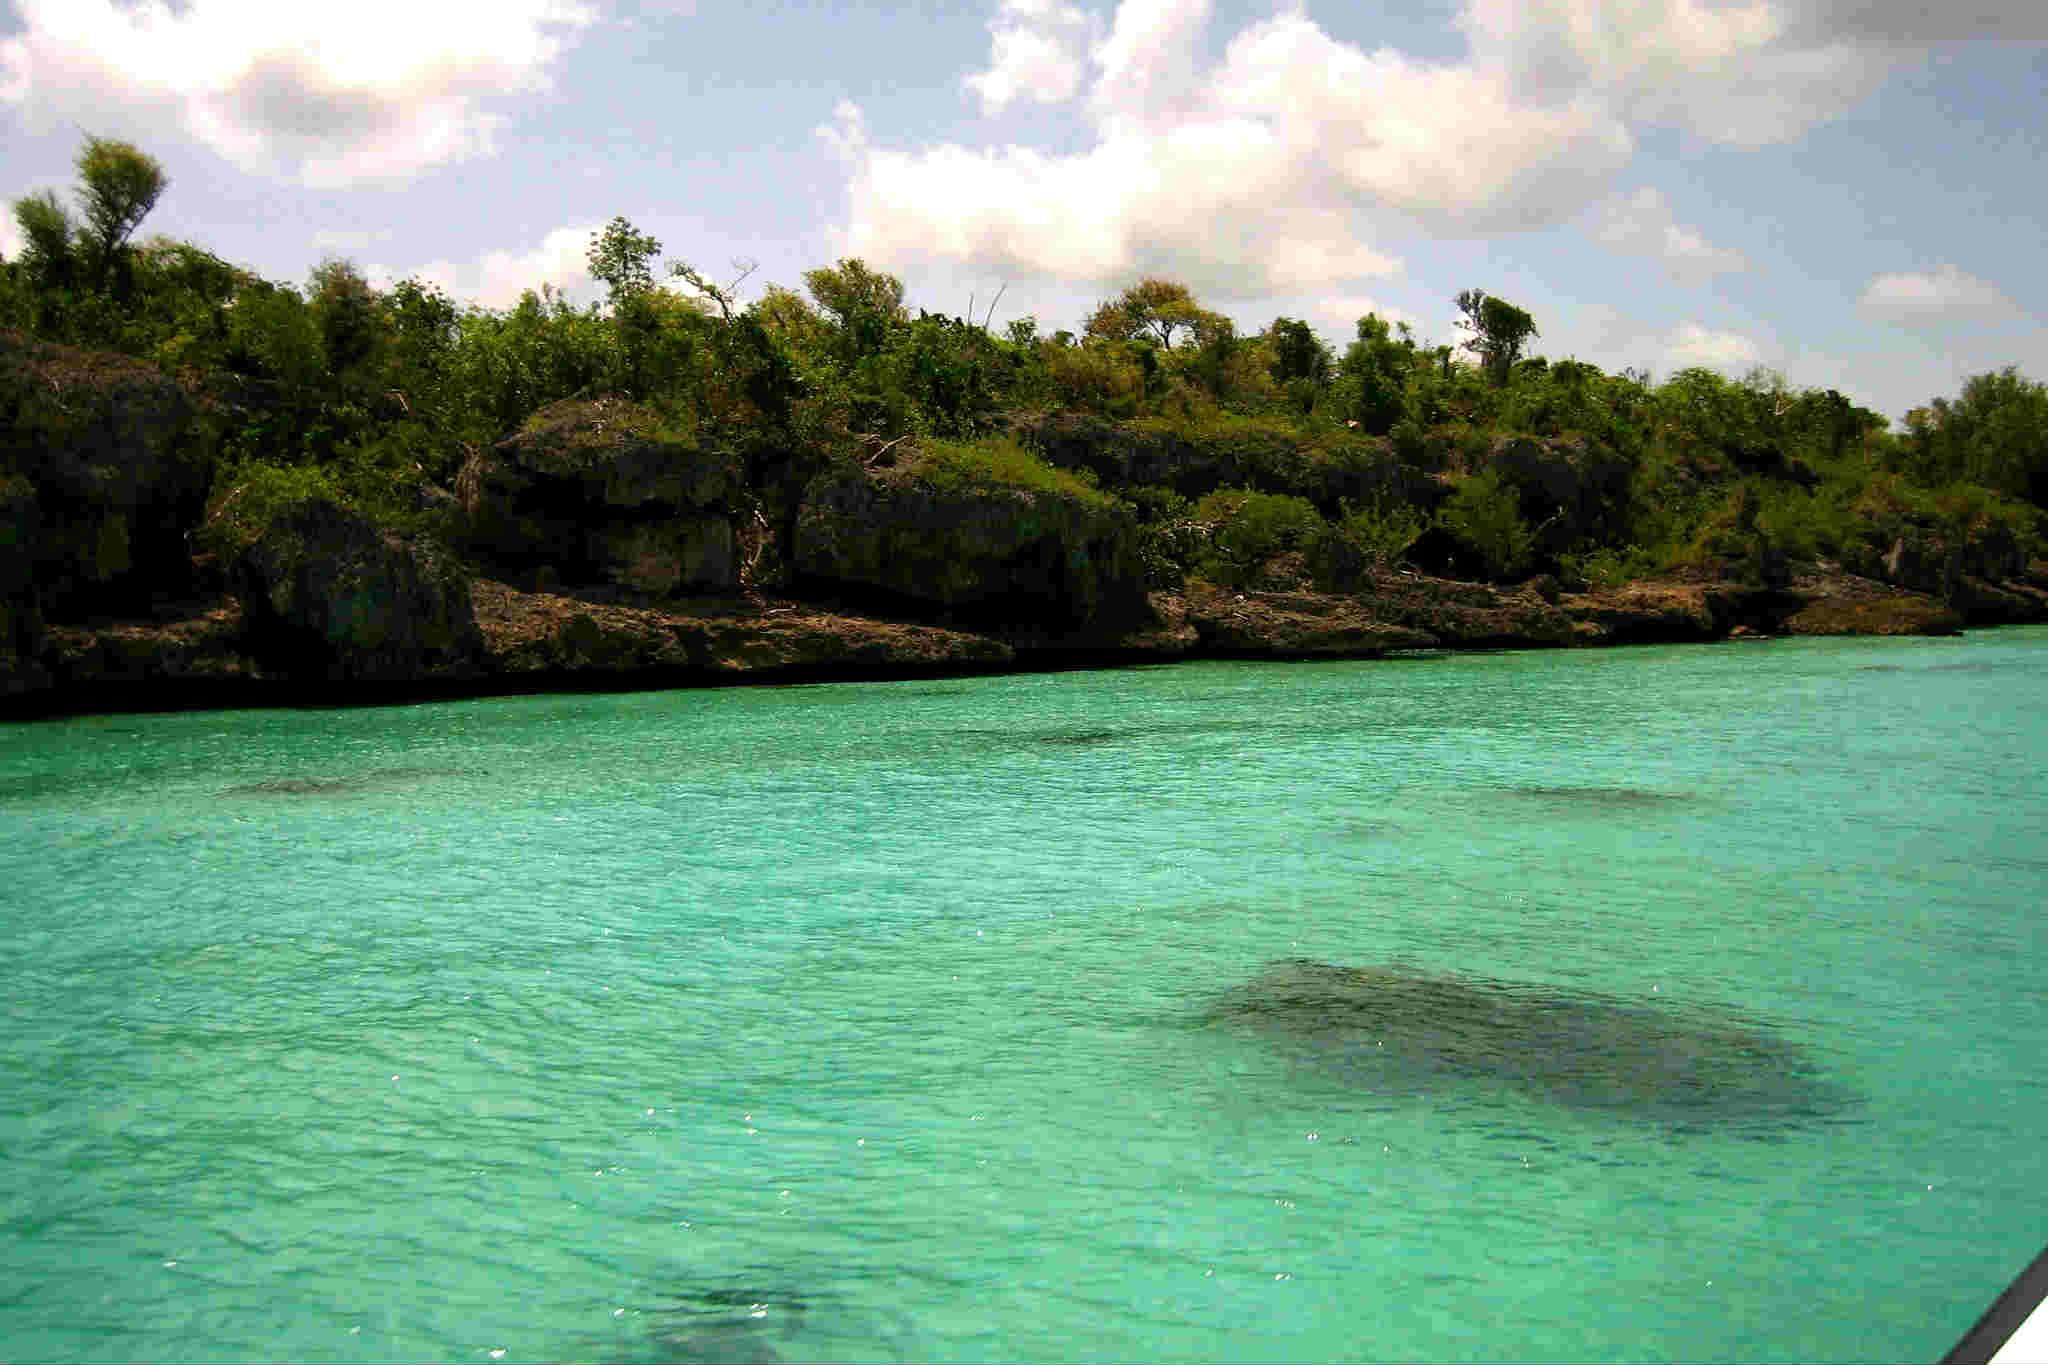 Soana la isla Foto Los Incalificables